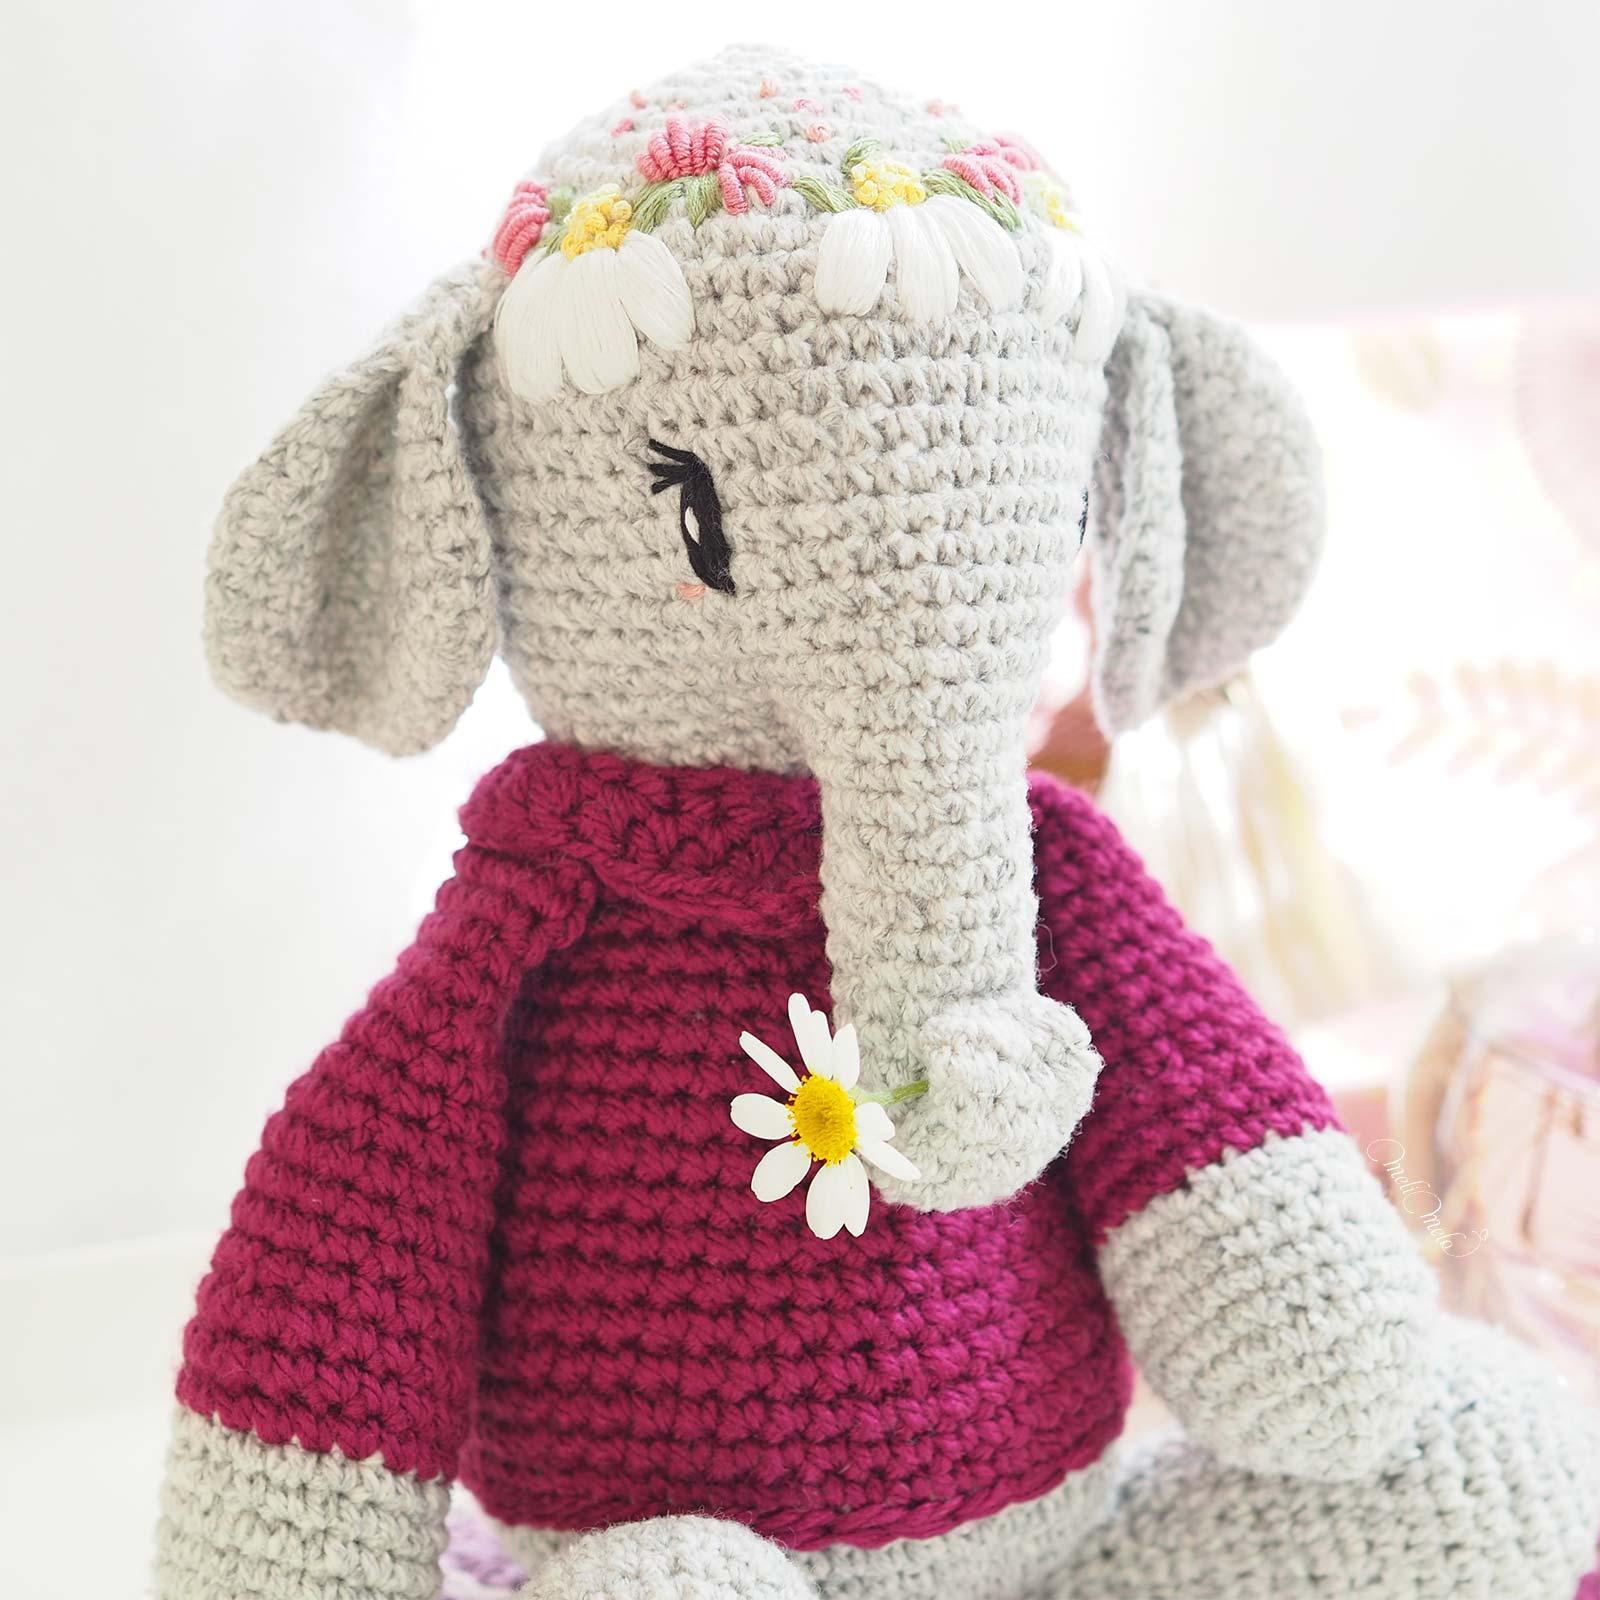 framboise-elephant-amigurumi-broderie-couronne-fleurs-laboutiquedemelimelo